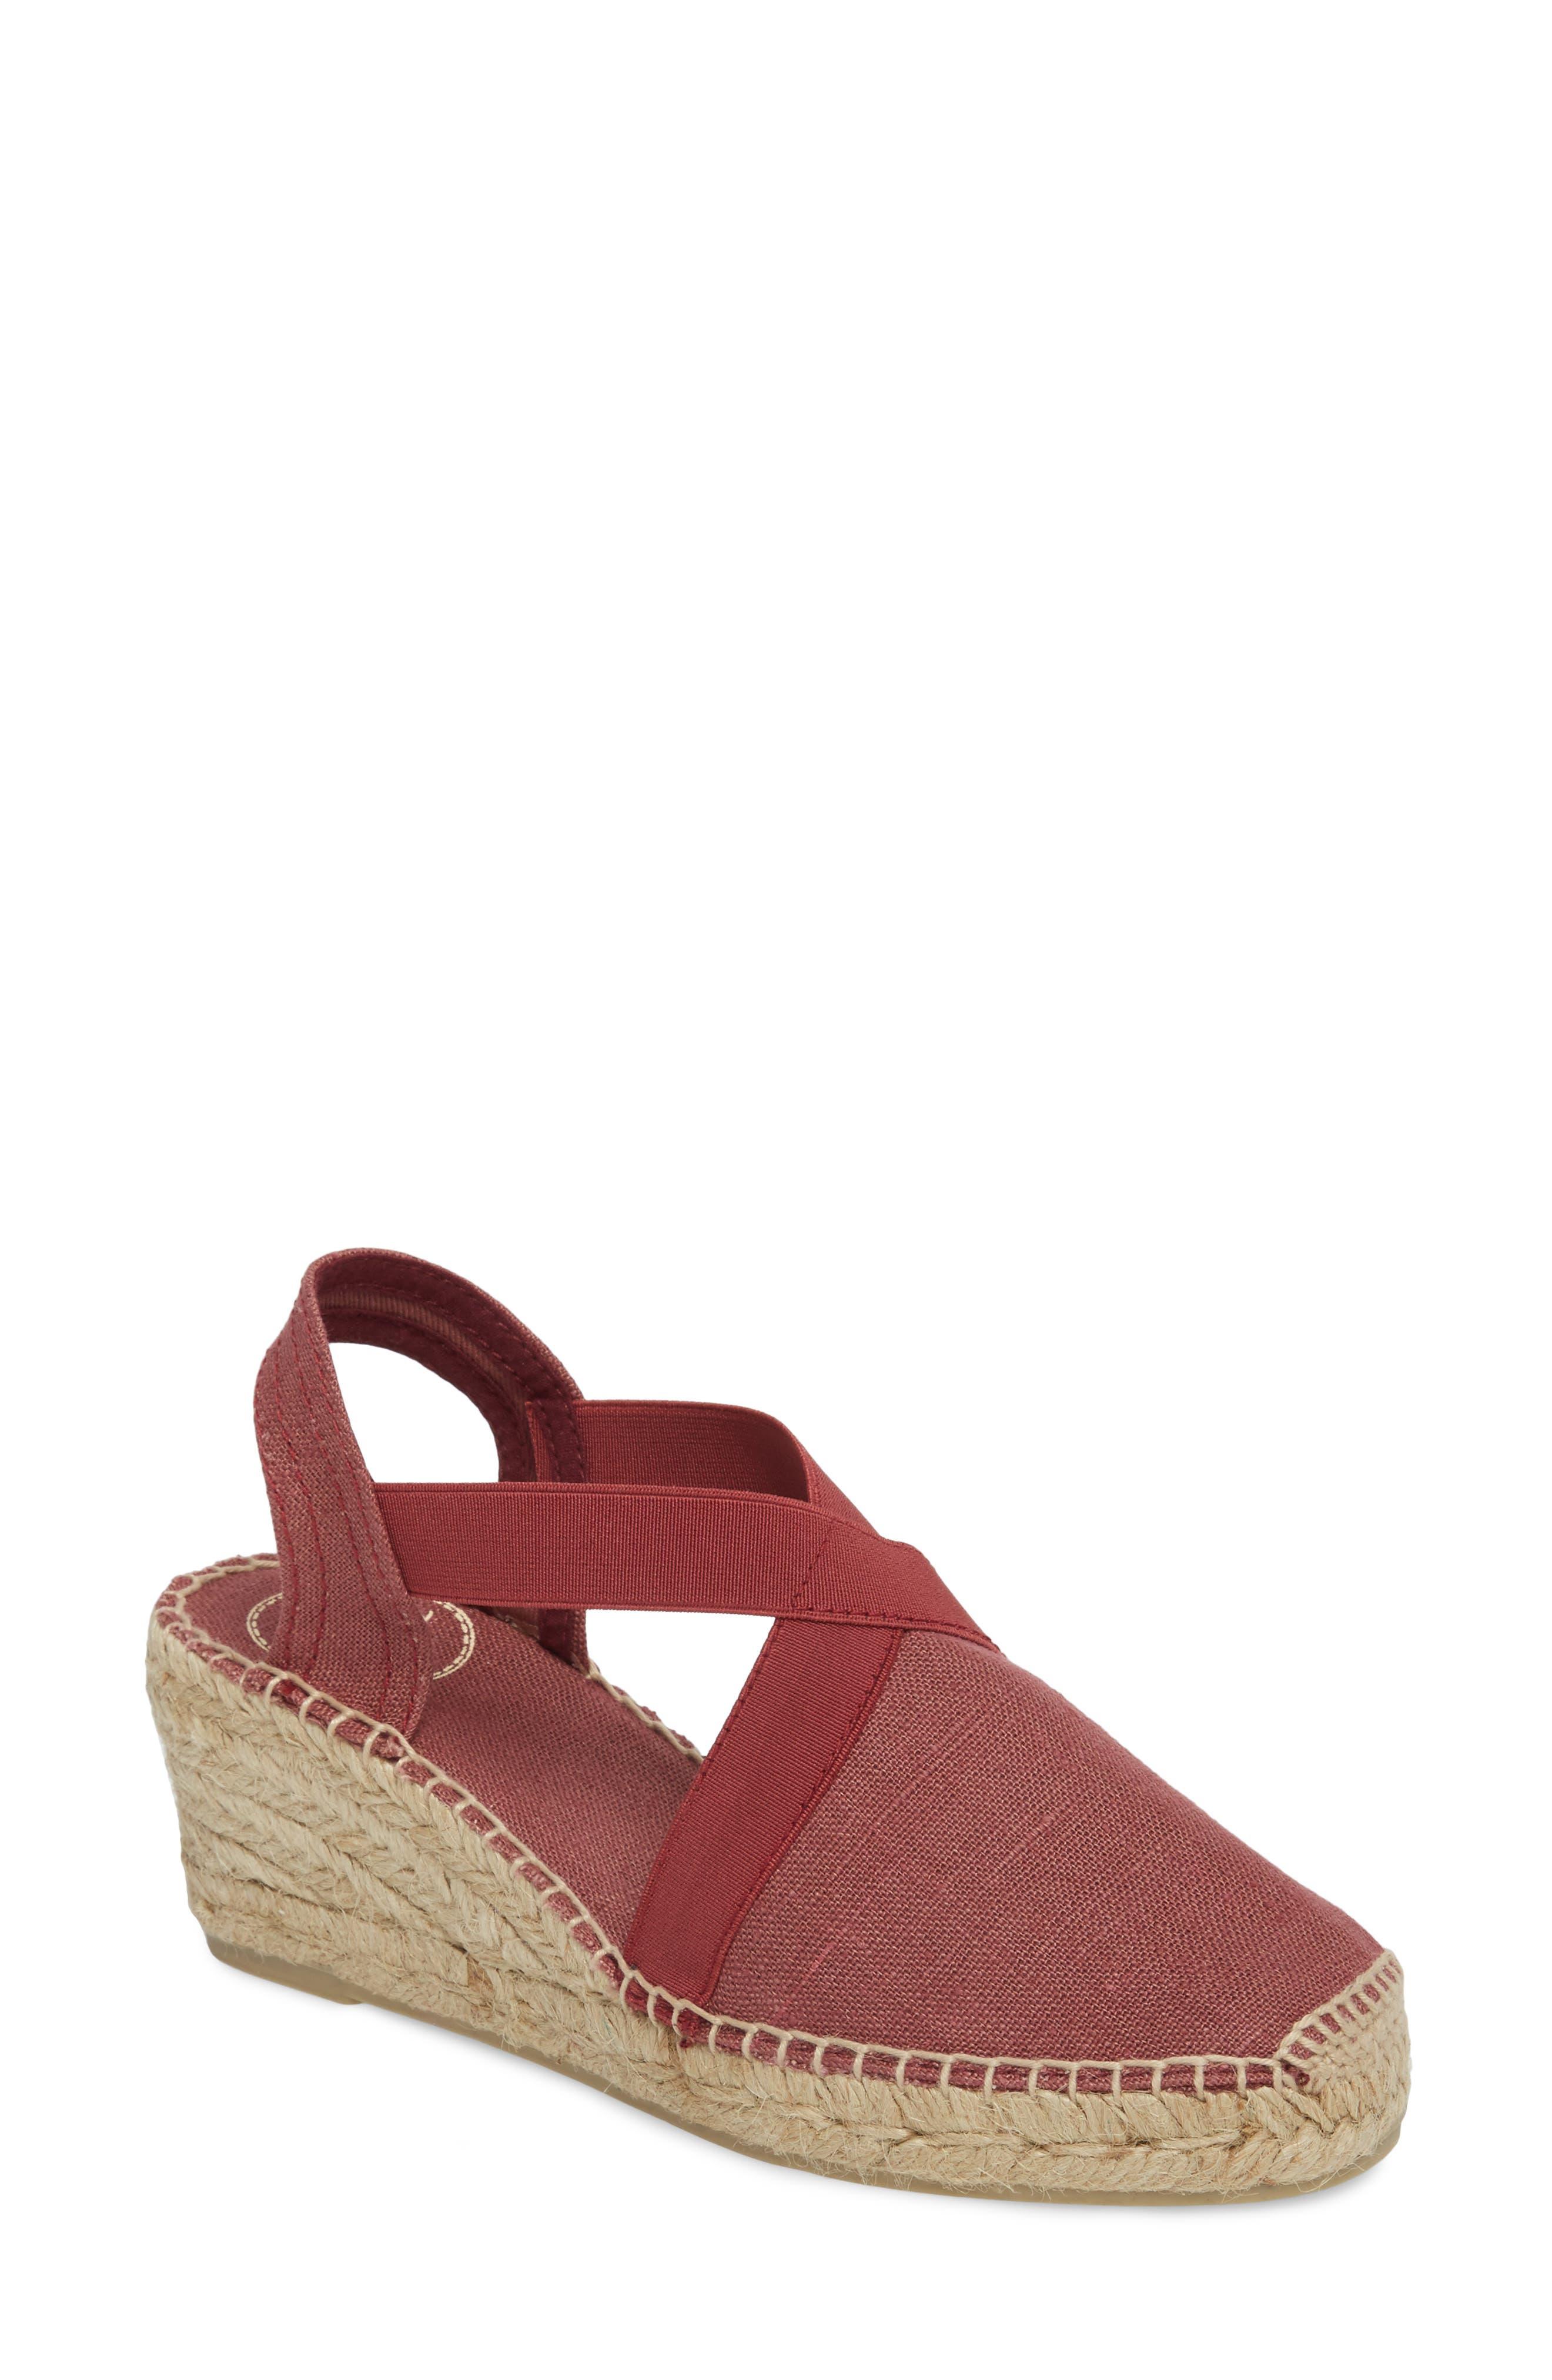 Online Sale Womens Sandals Vaneli Neva Red Naif Print